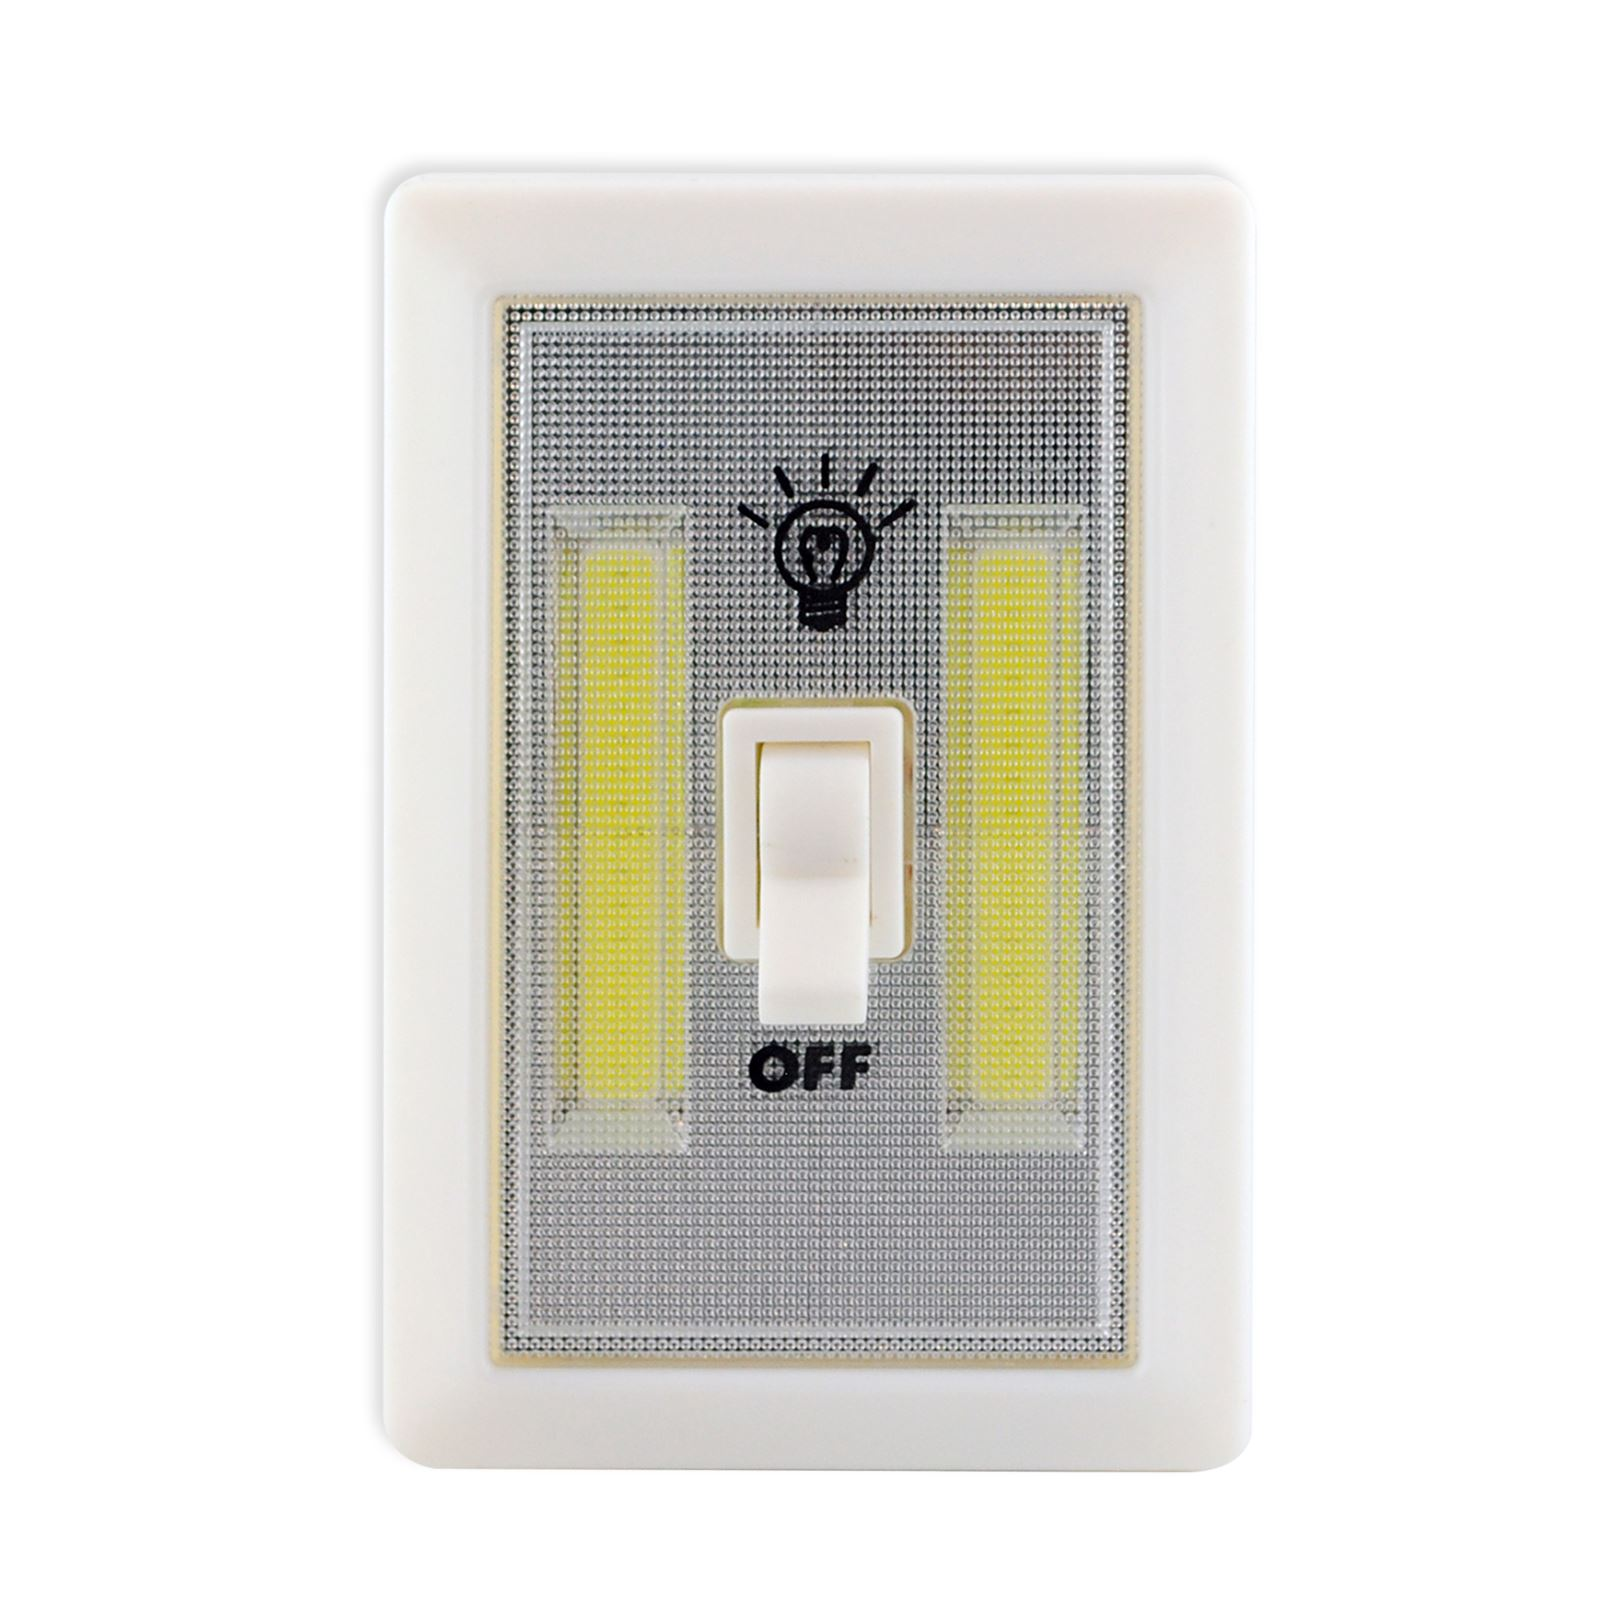 Cob Led 2w Light Switch Super Bright Battery Powered No